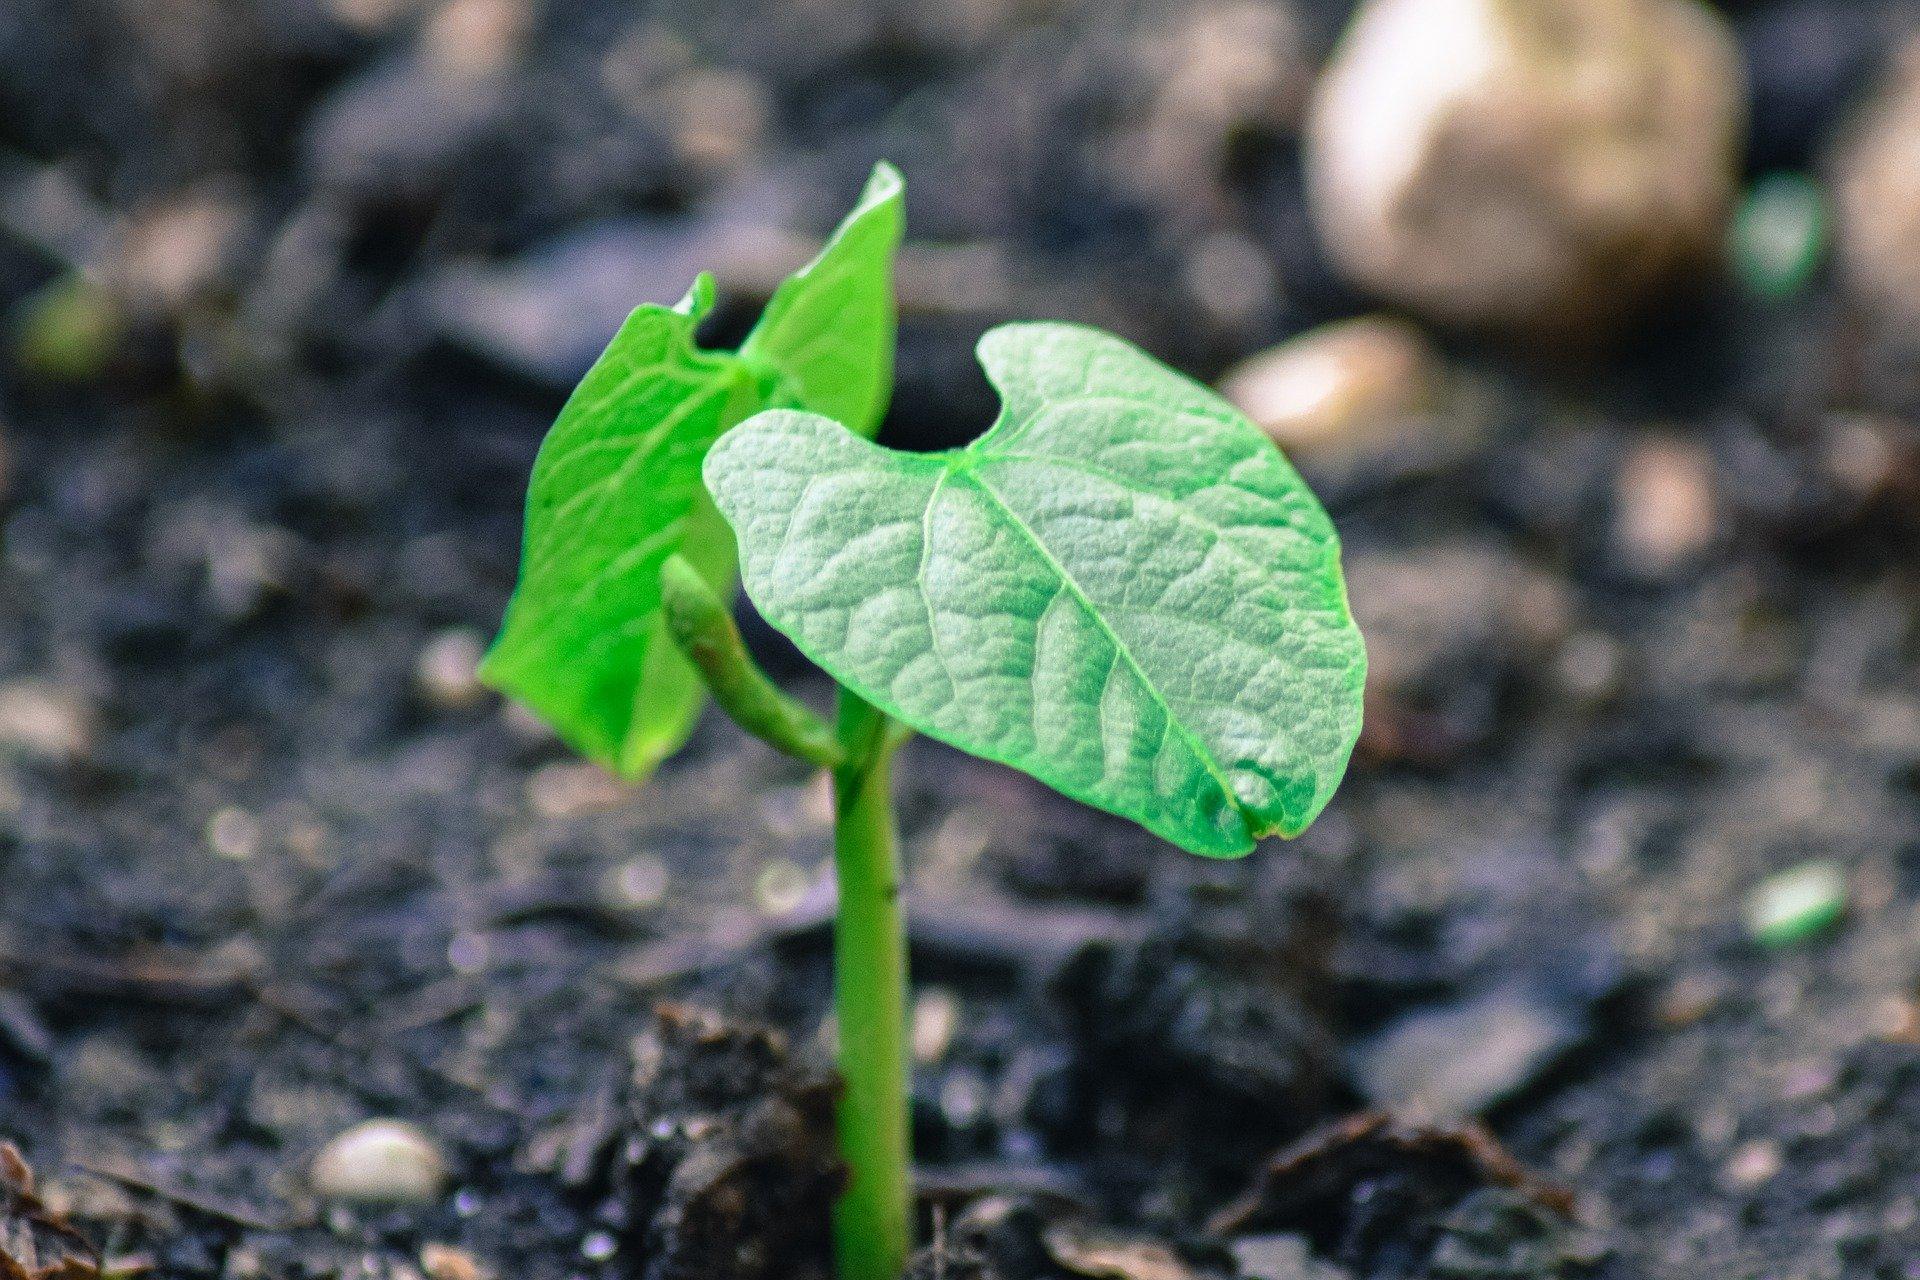 Freshly emerged plant